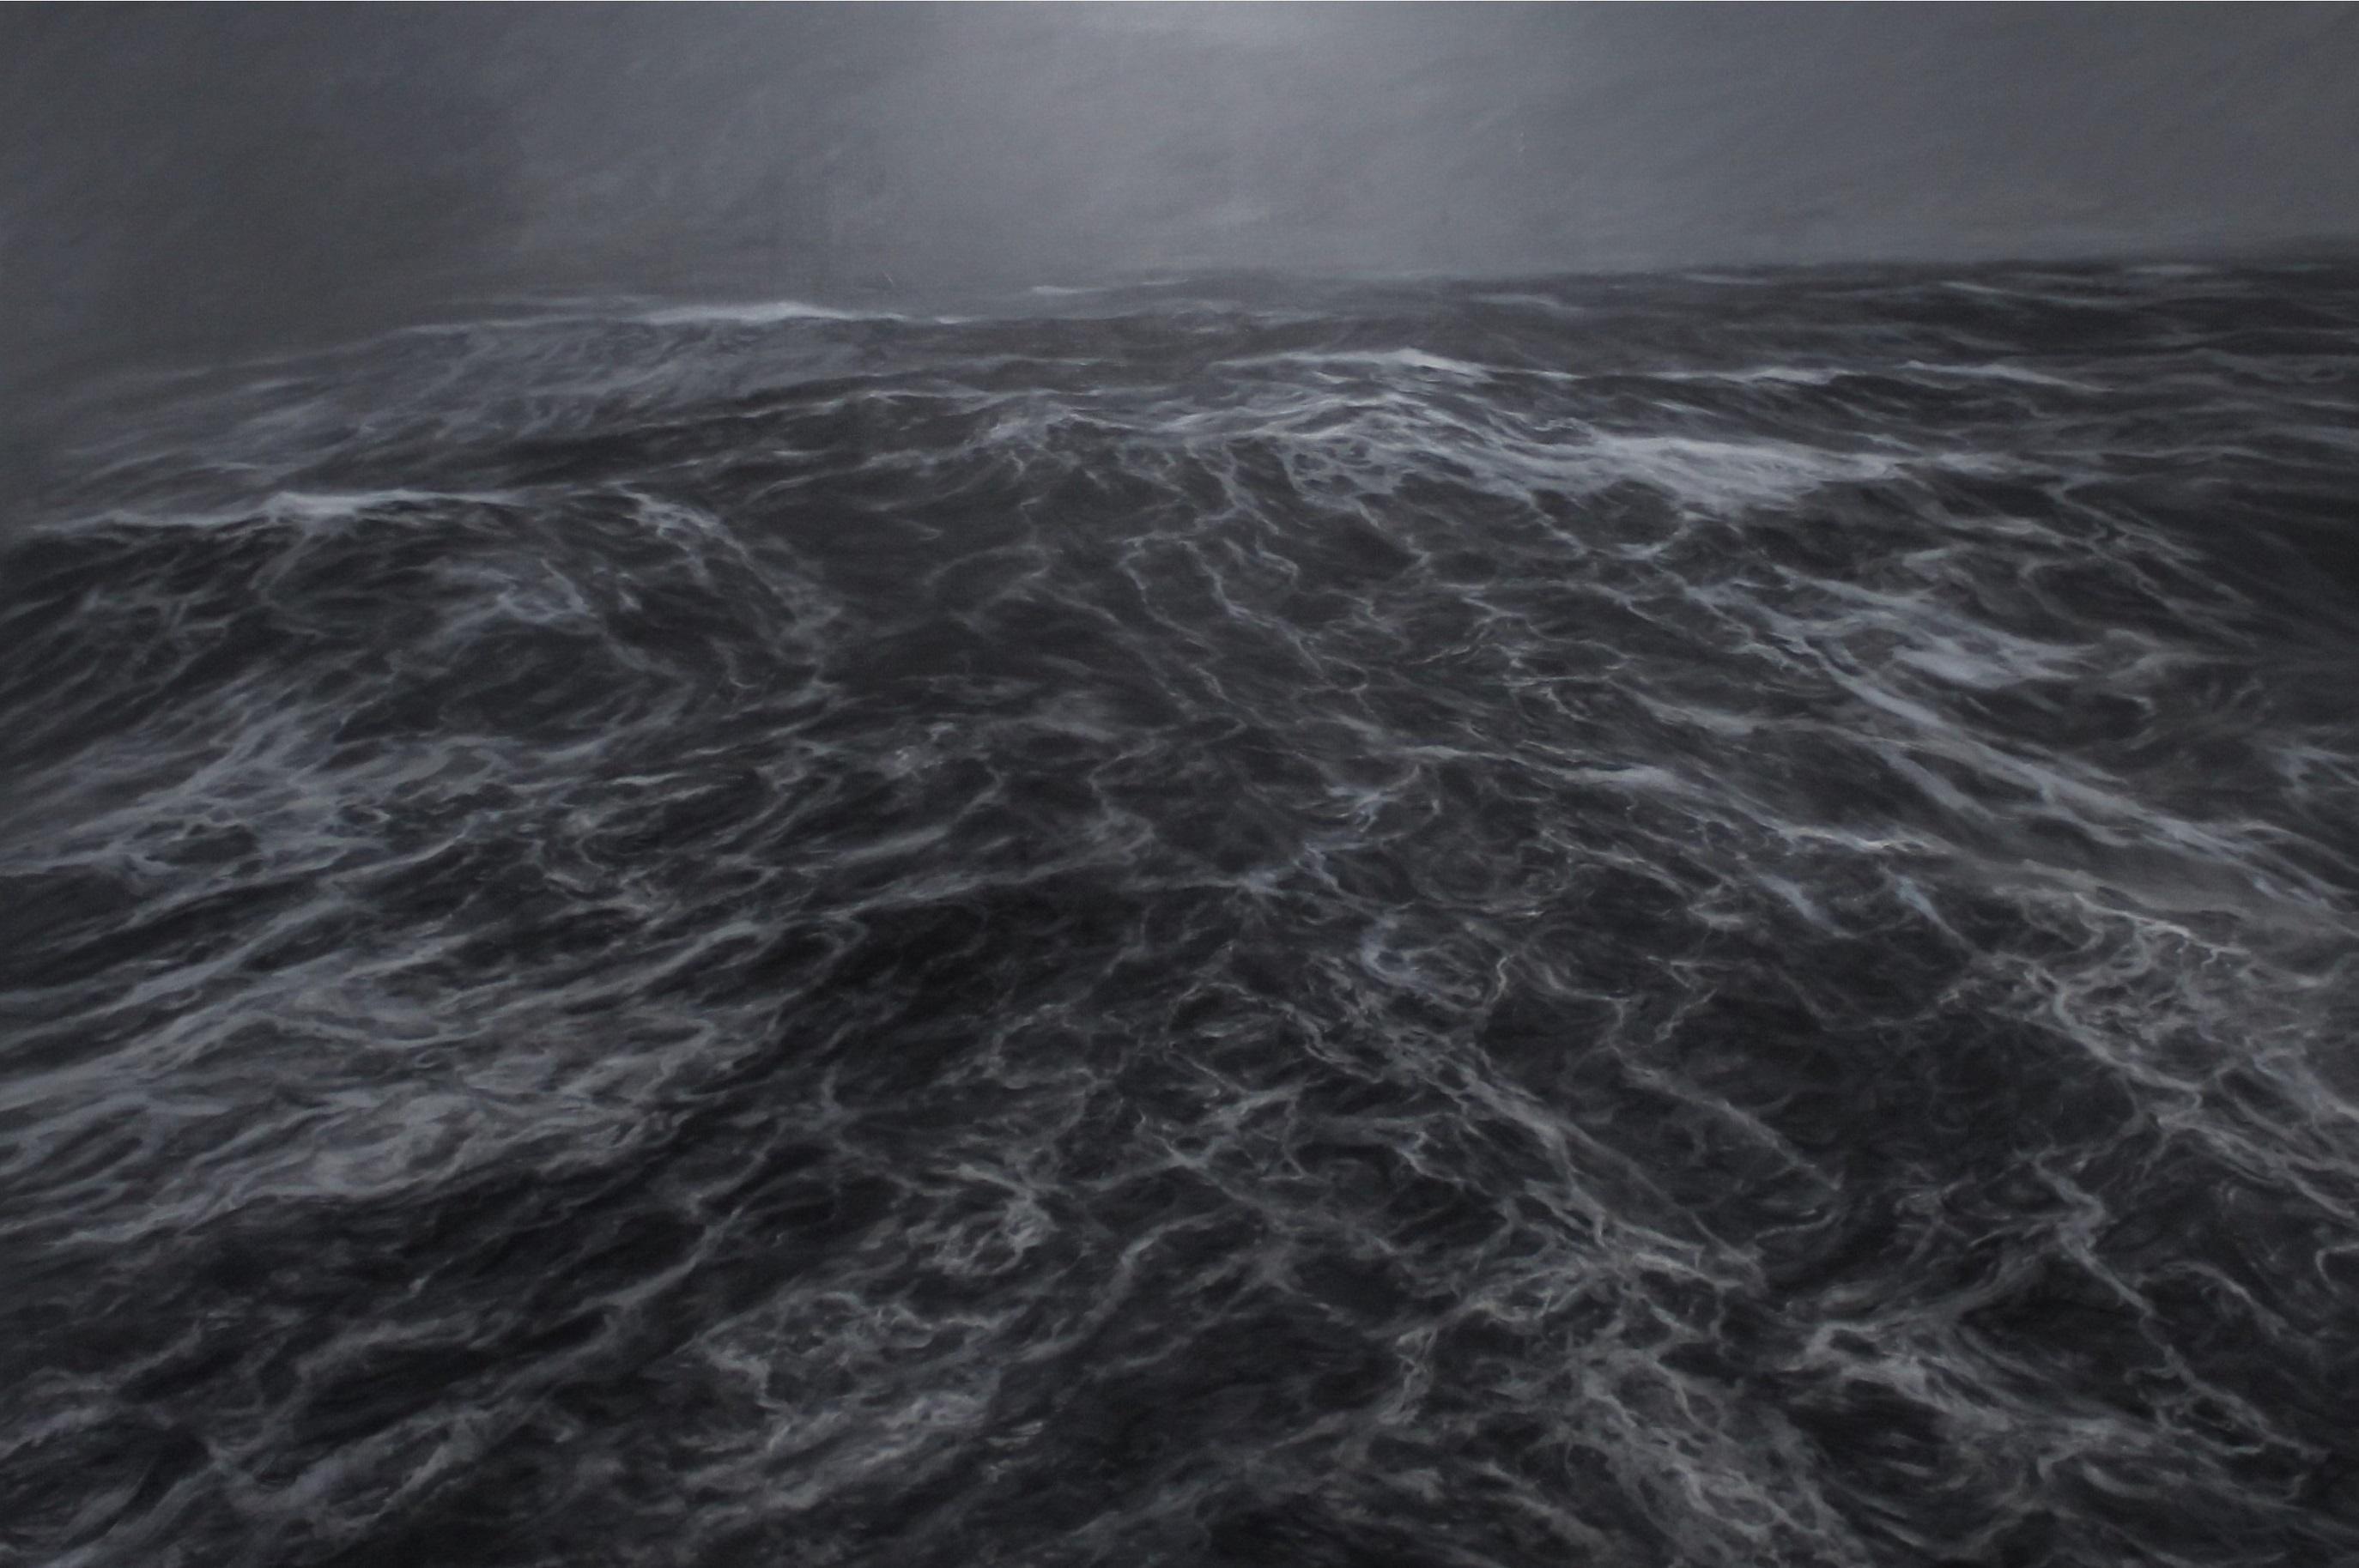 Dark Clamour by F. S. Borquez - Seascape painting, Ocean waves, Large canvas